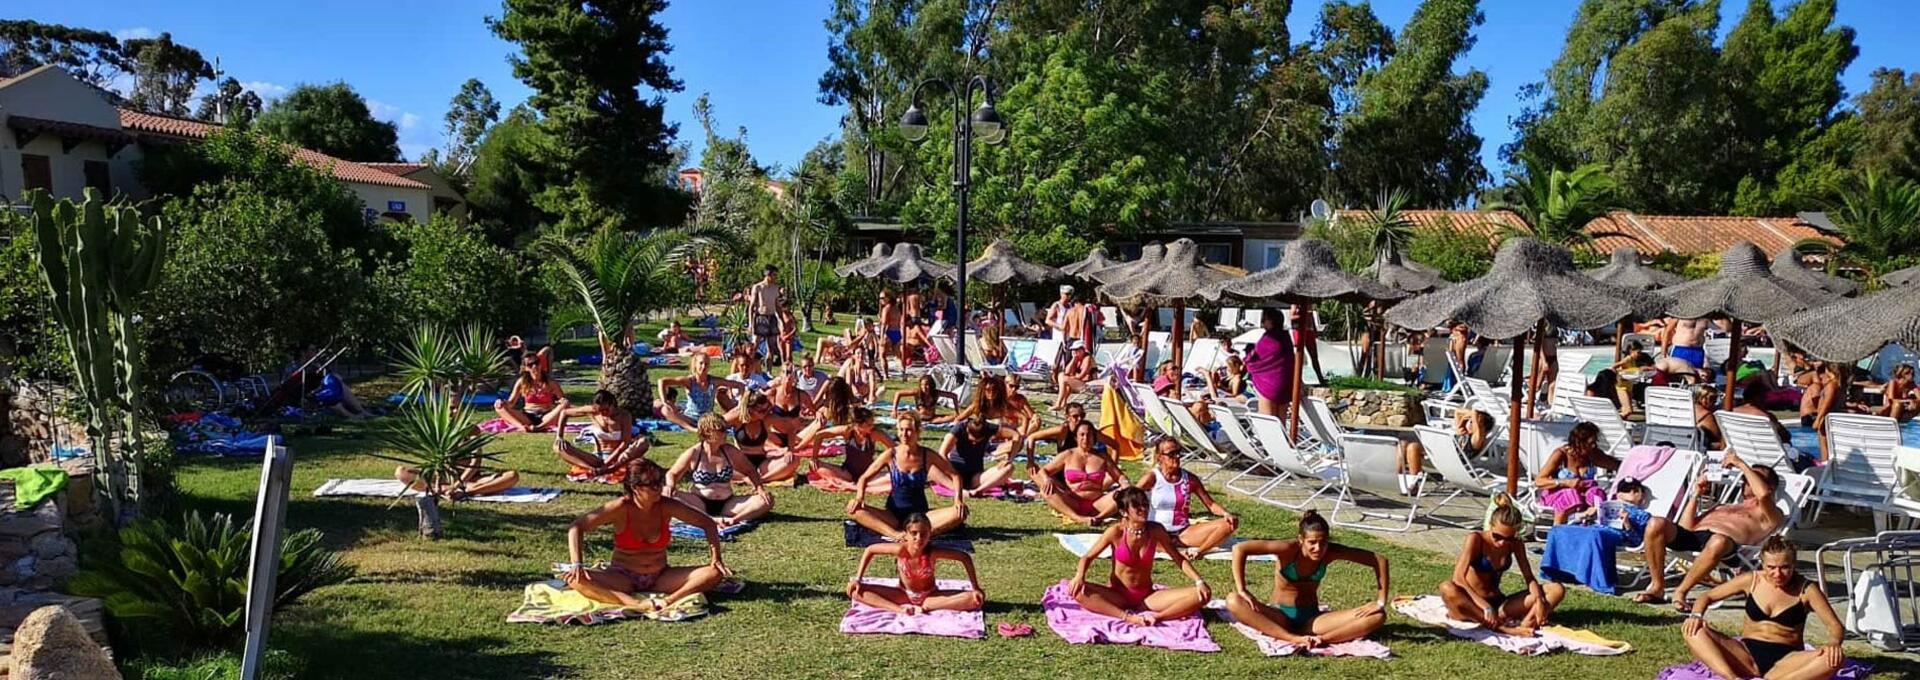 4mori en holiday-resort-sardinia 016